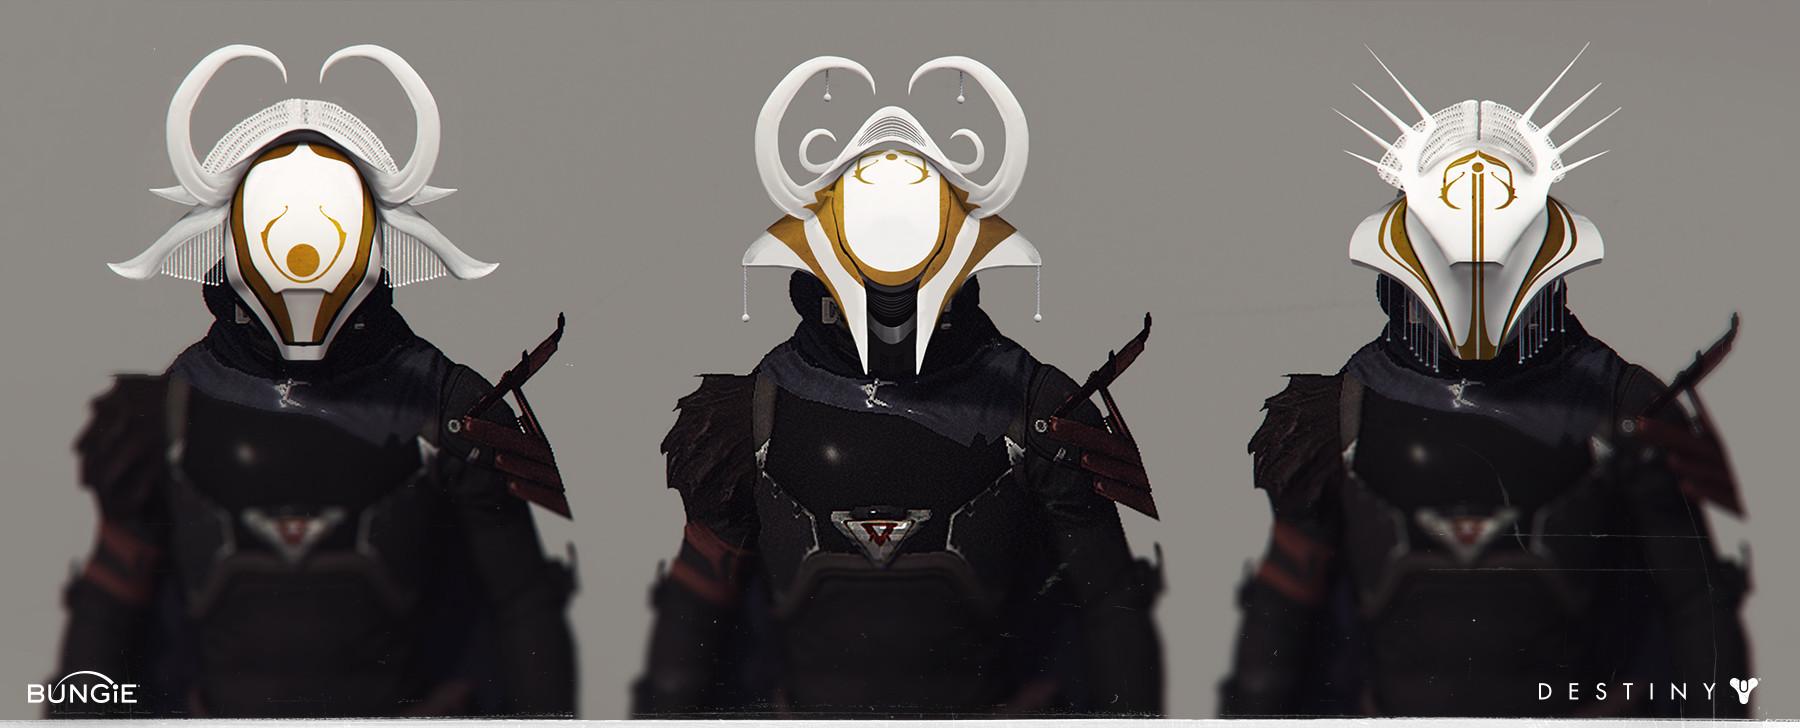 Joseph cross jc dawning masks